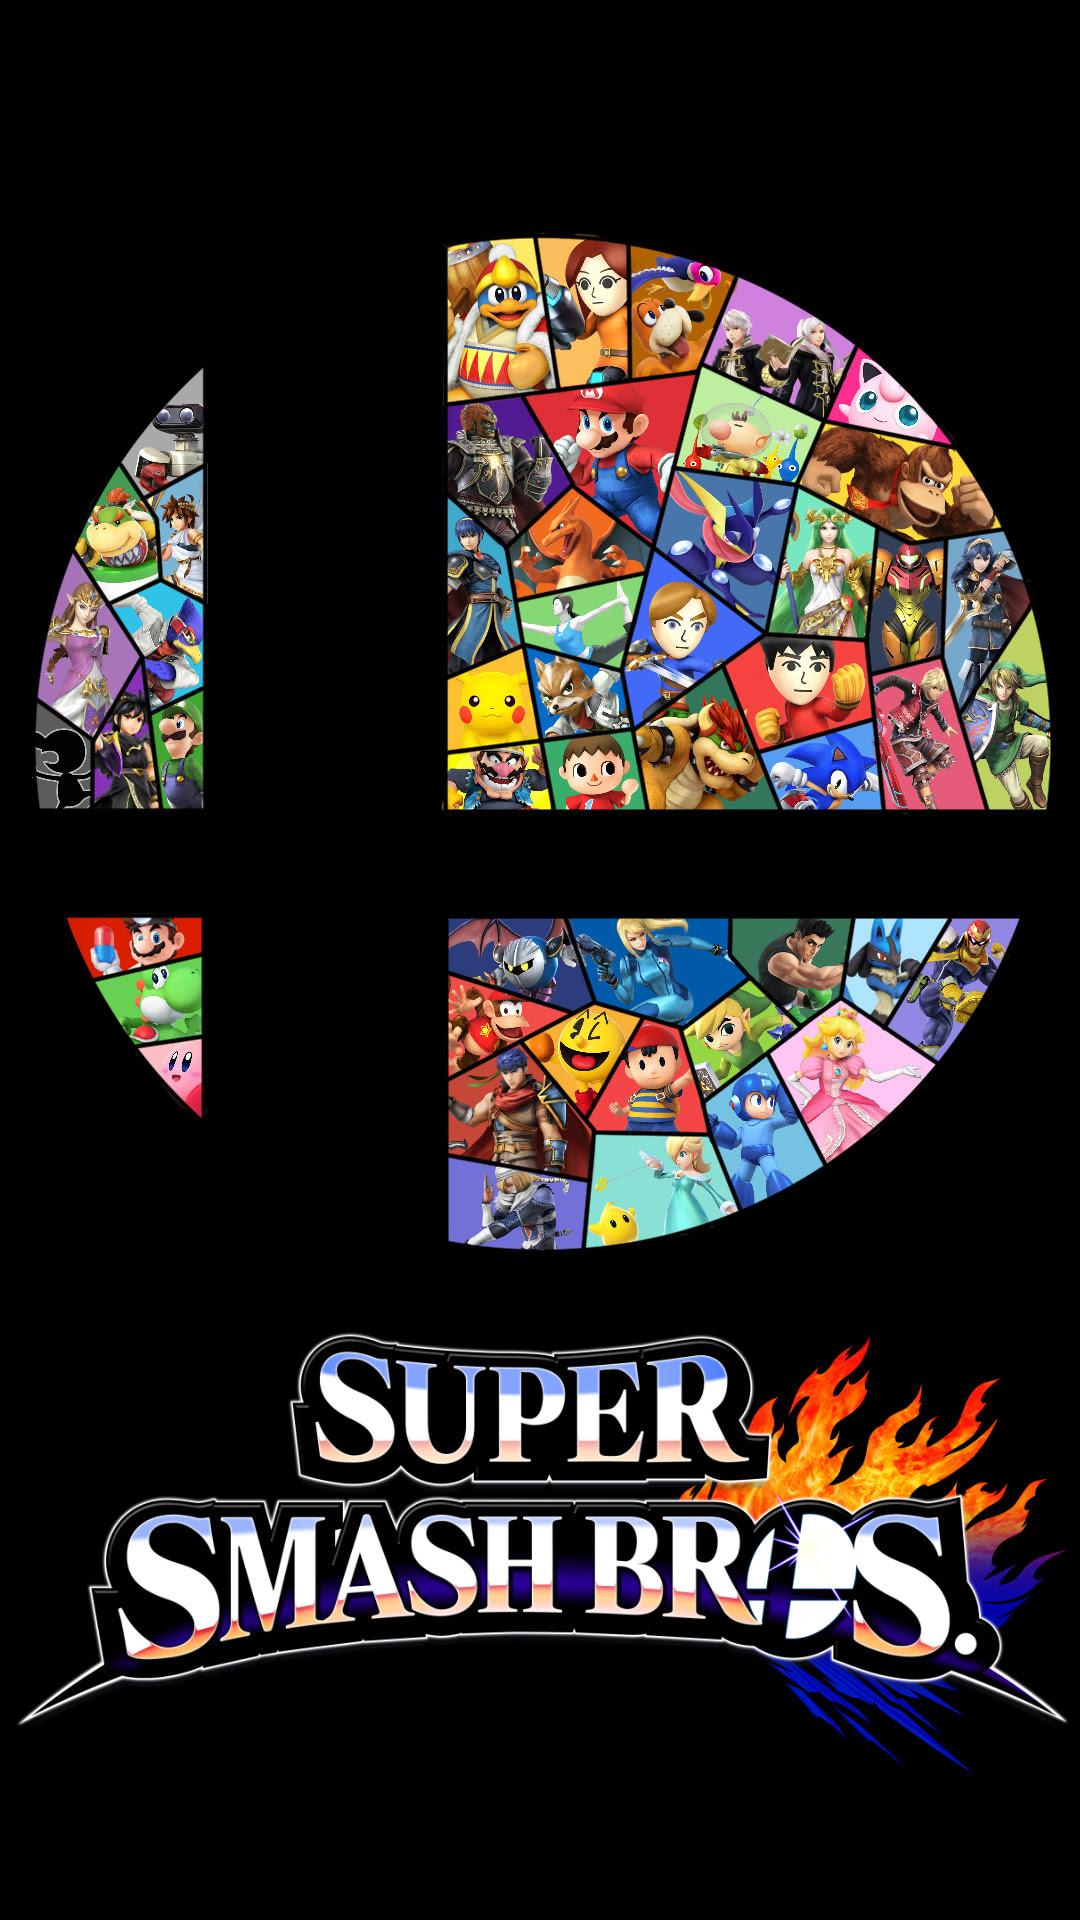 Super Smash Bros Wallpaper iPhone 75+ images